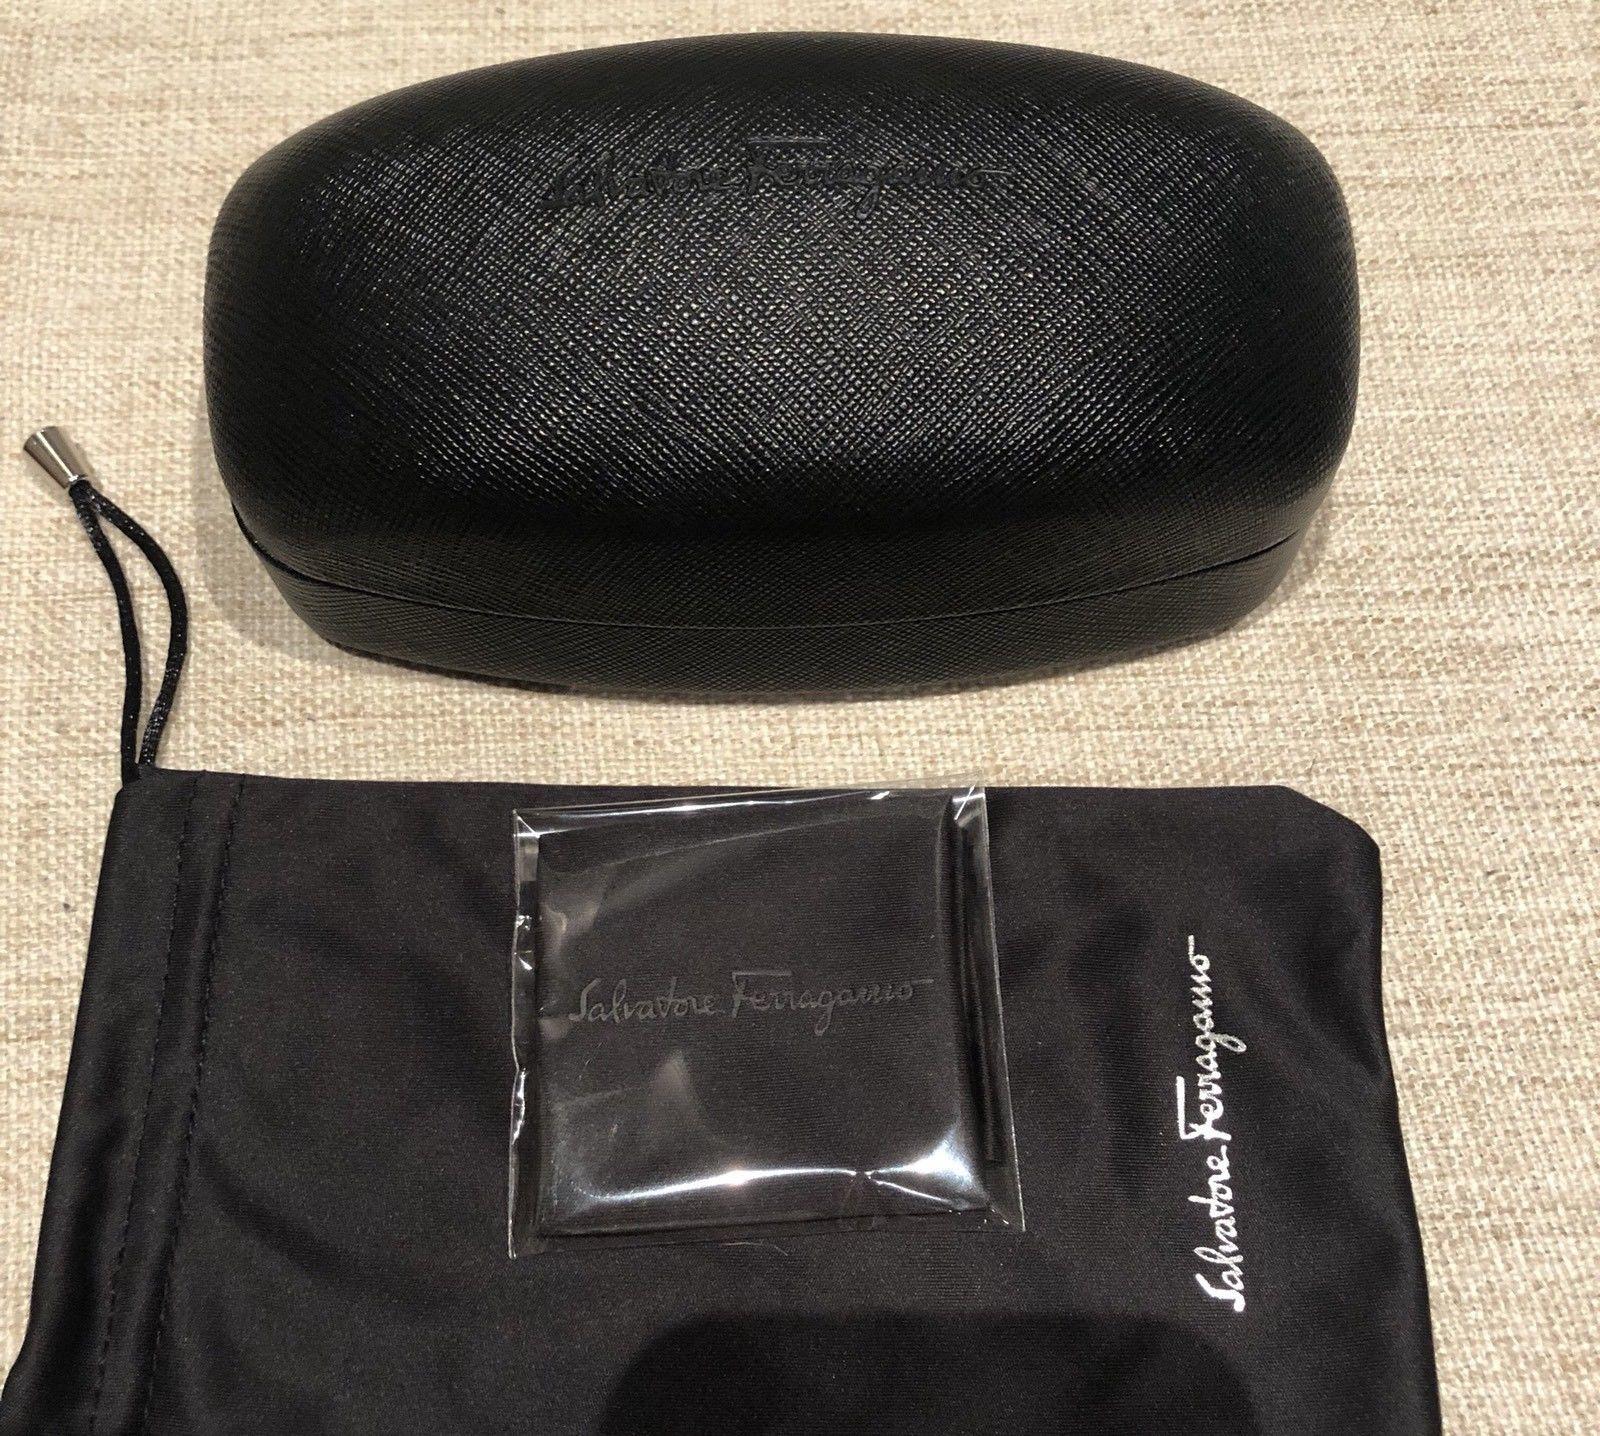 eea056303 Salvatore Ferragamo hard case cloth and 29 similar items. S l1600